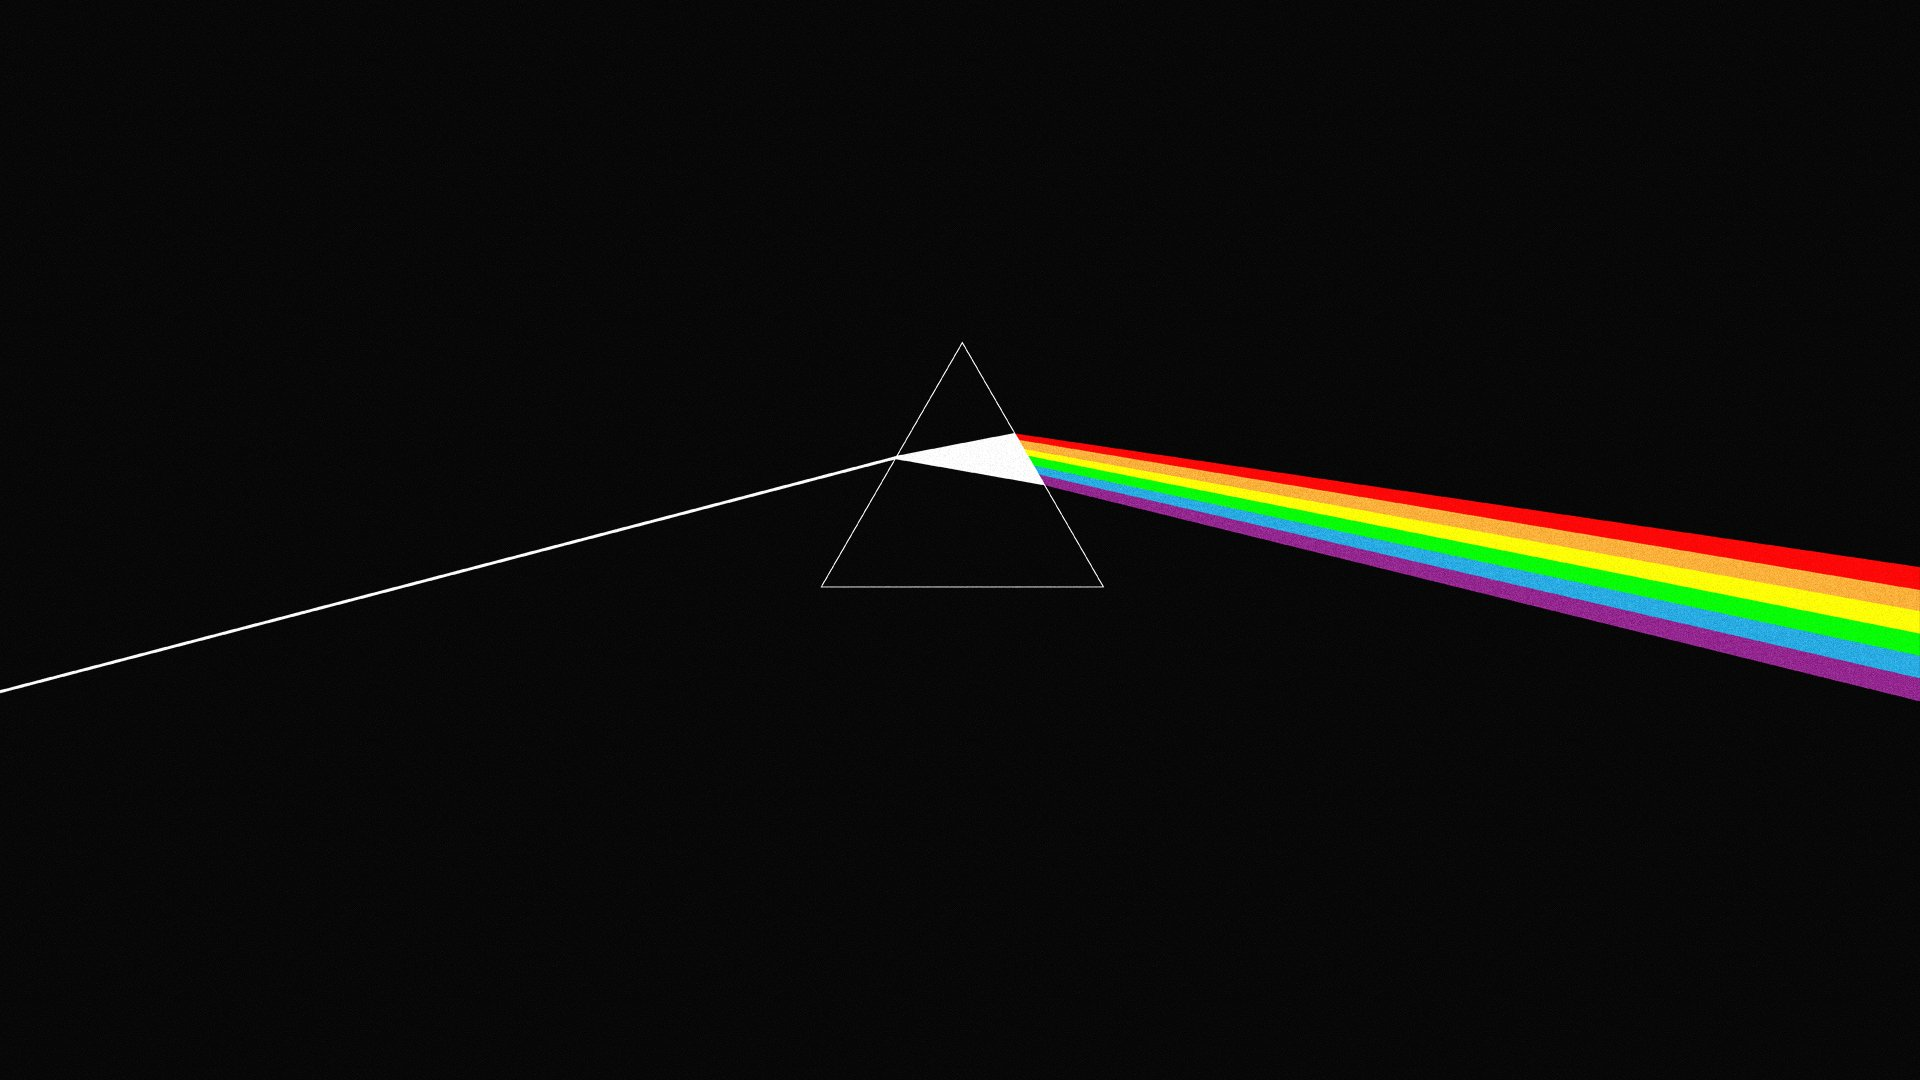 47 Pink Floyd Hd Wallpapers On Wallpapersafari